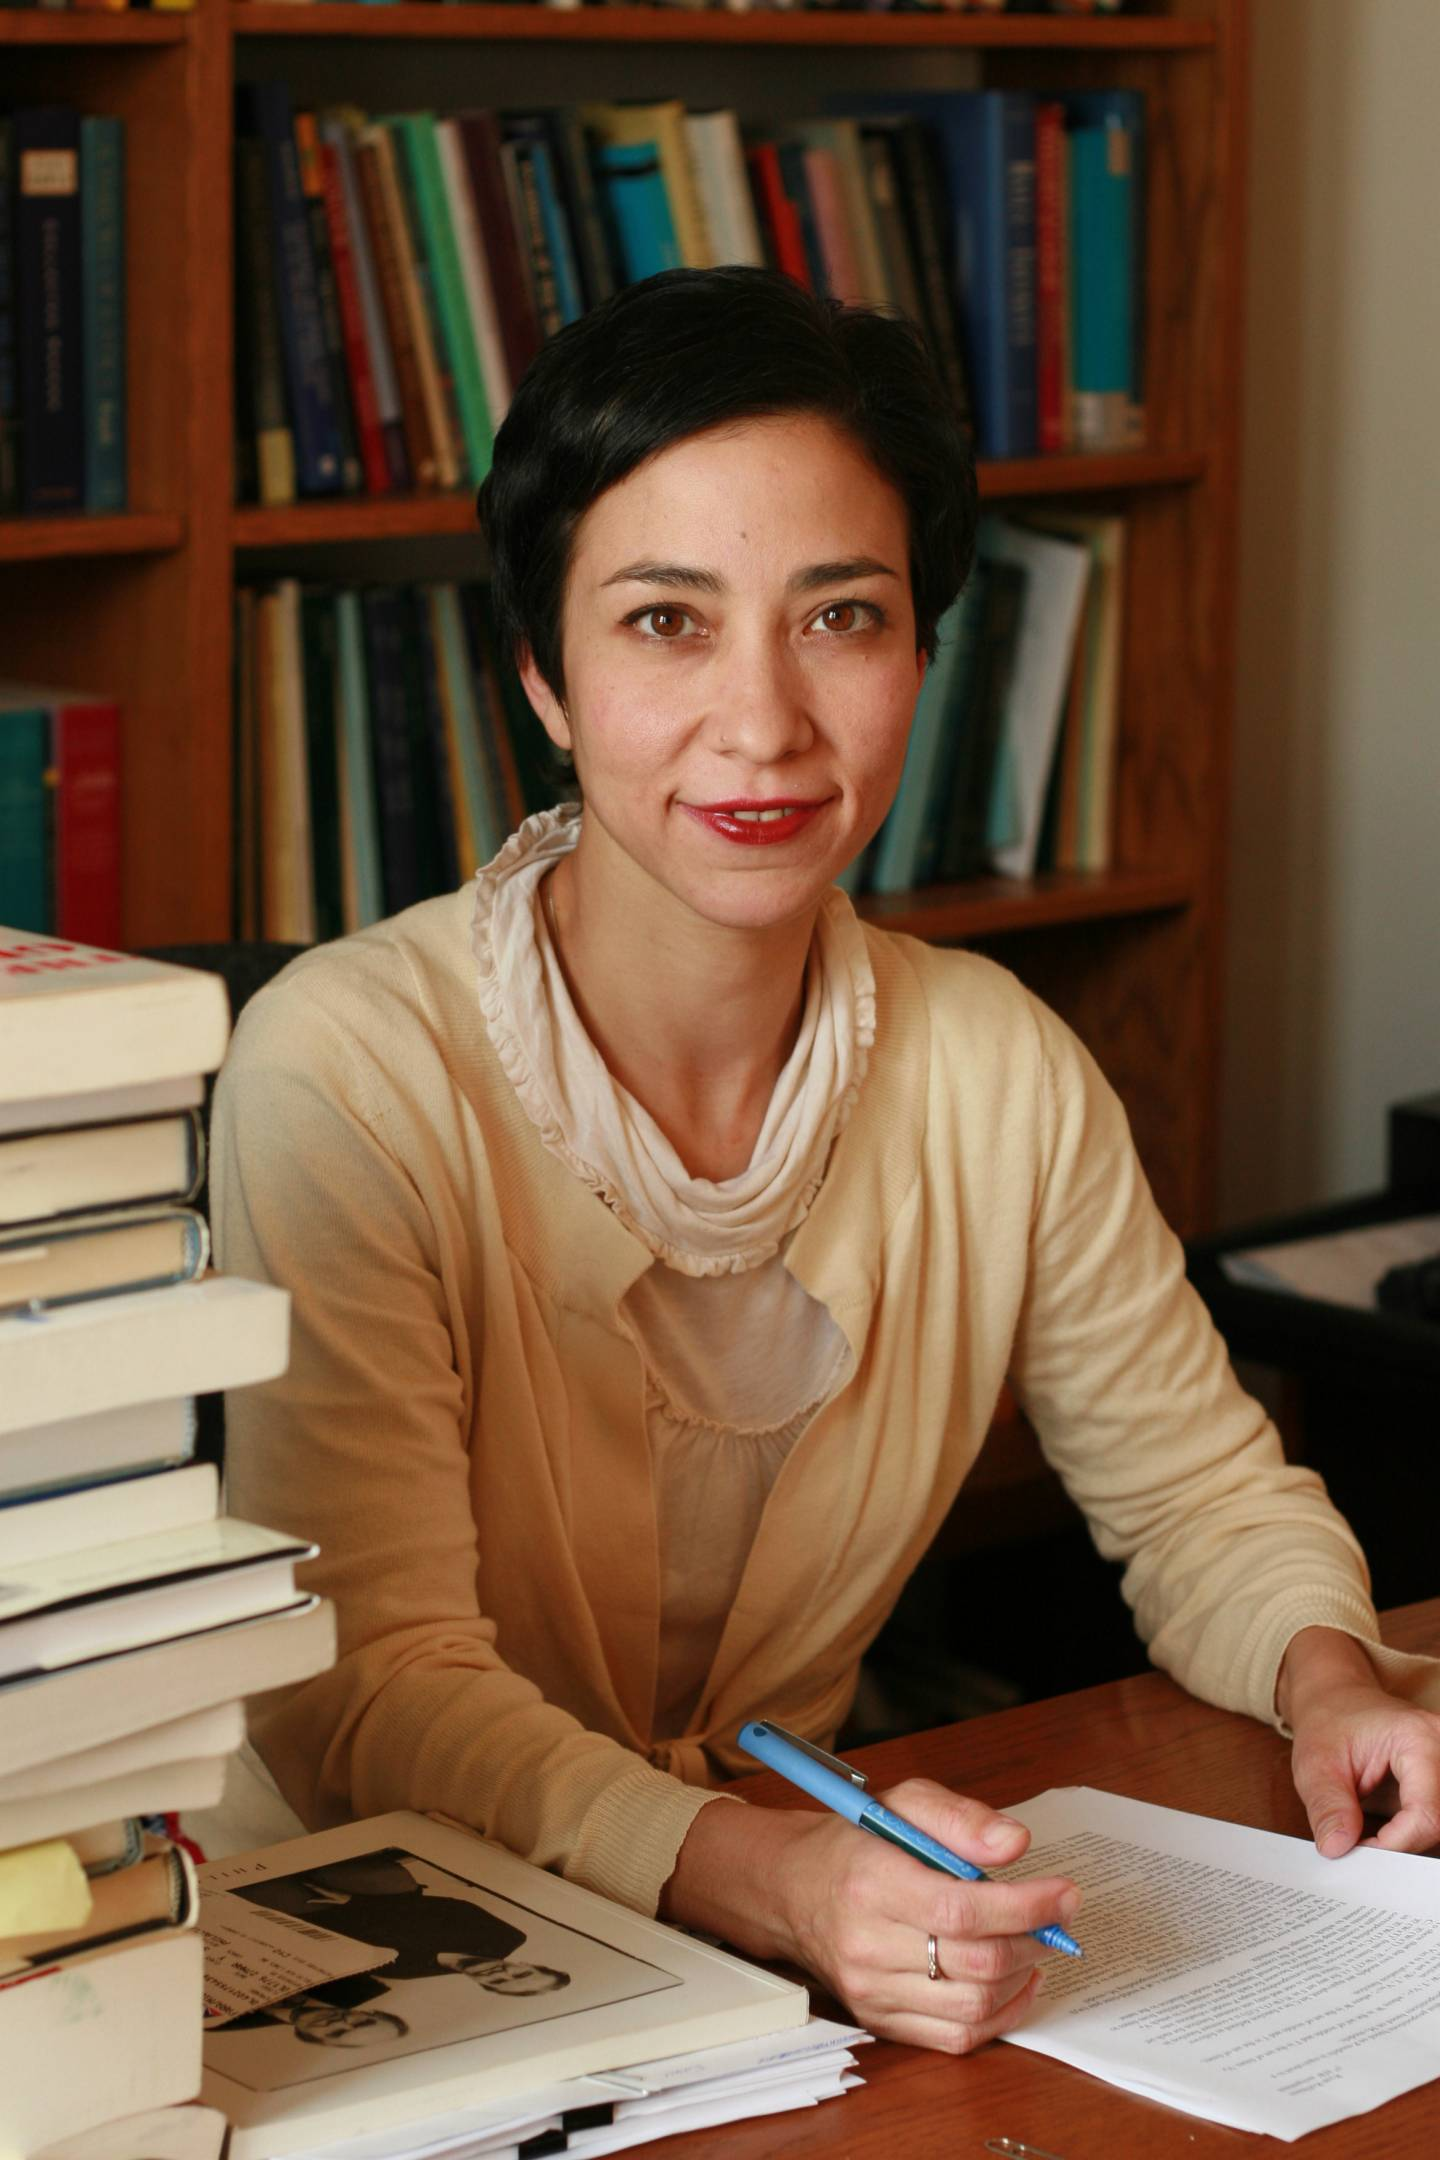 Princeton Professor Delia Graff Fara An Eminent